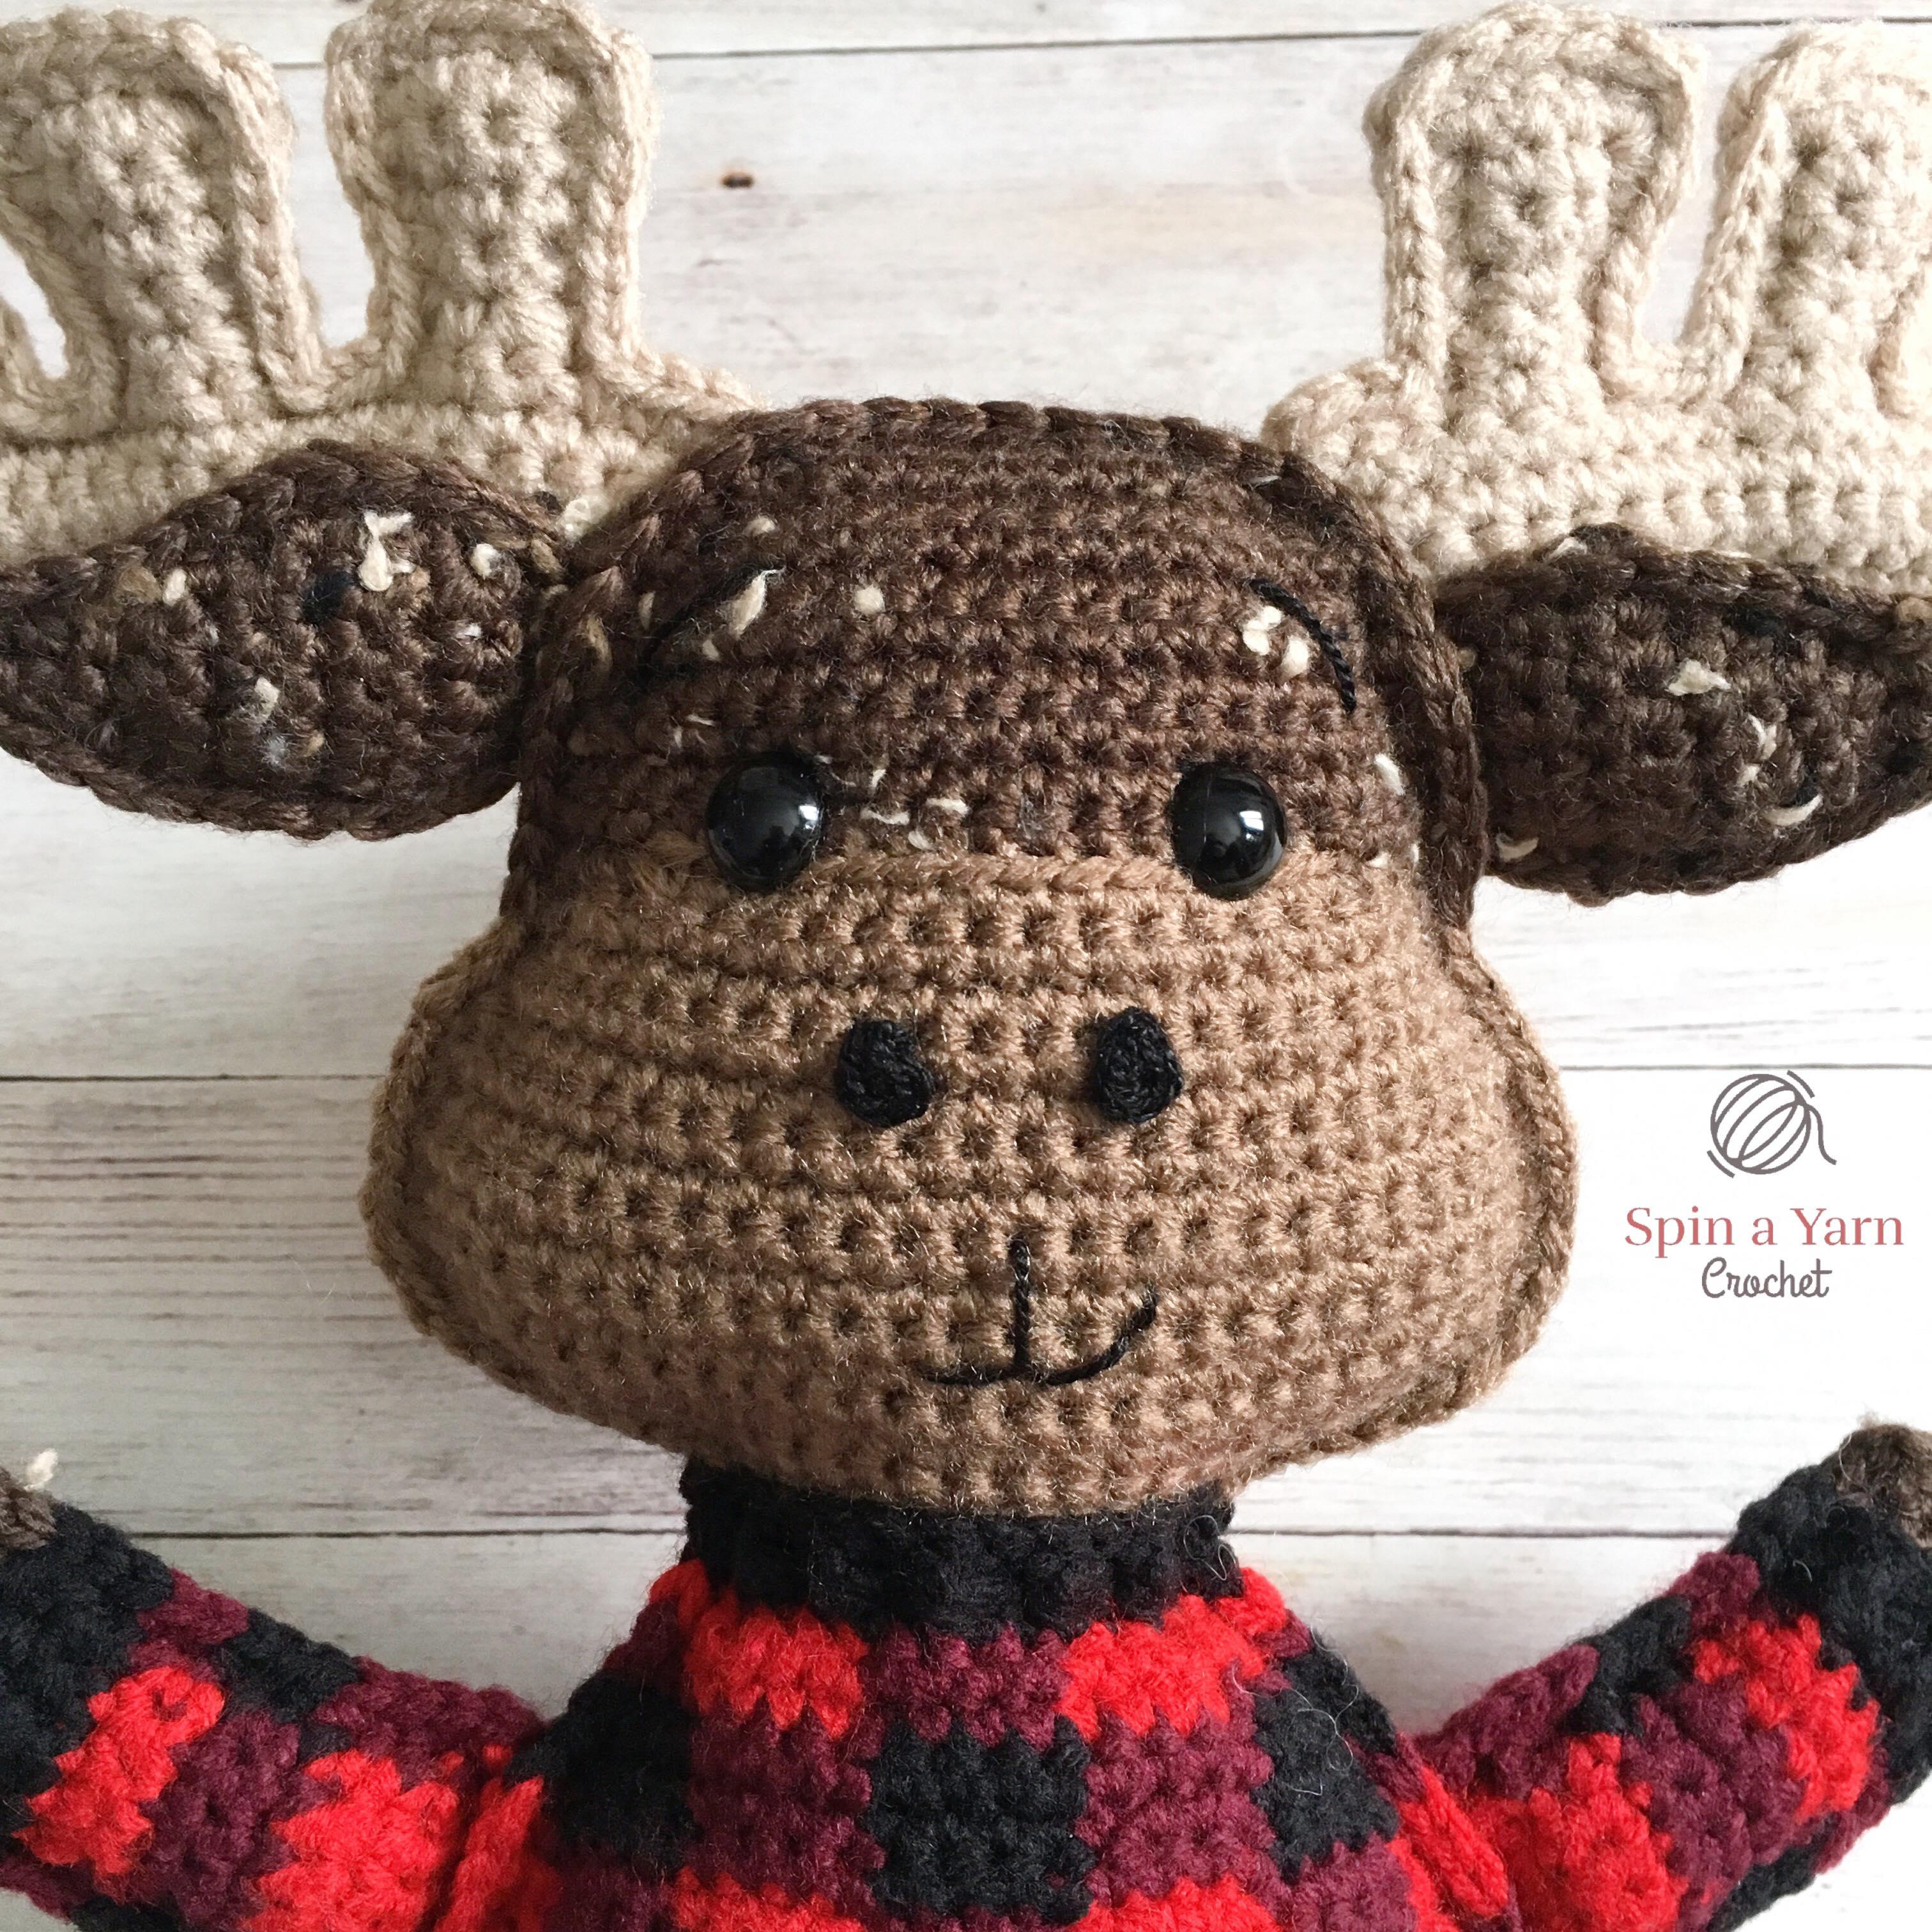 efbf7ad00 Moose Amigurumi Free Crochet Pattern • Spin a Yarn Crochet